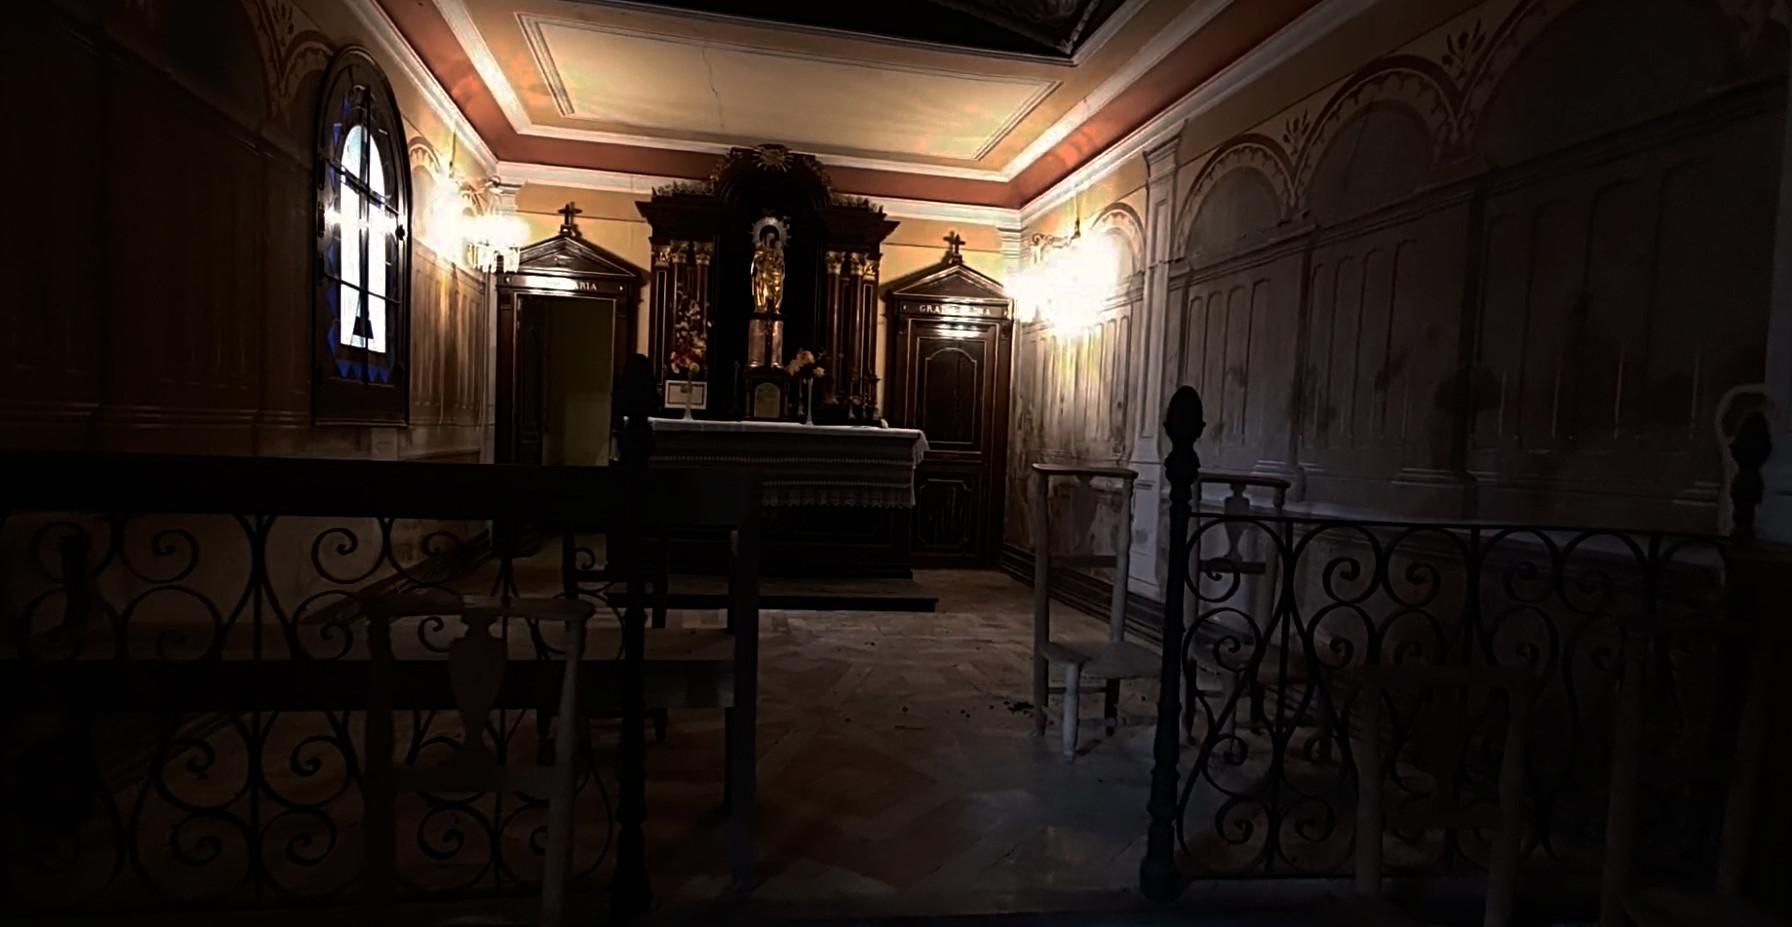 Capilla Casa Torre S XIX / 19th century house chapel